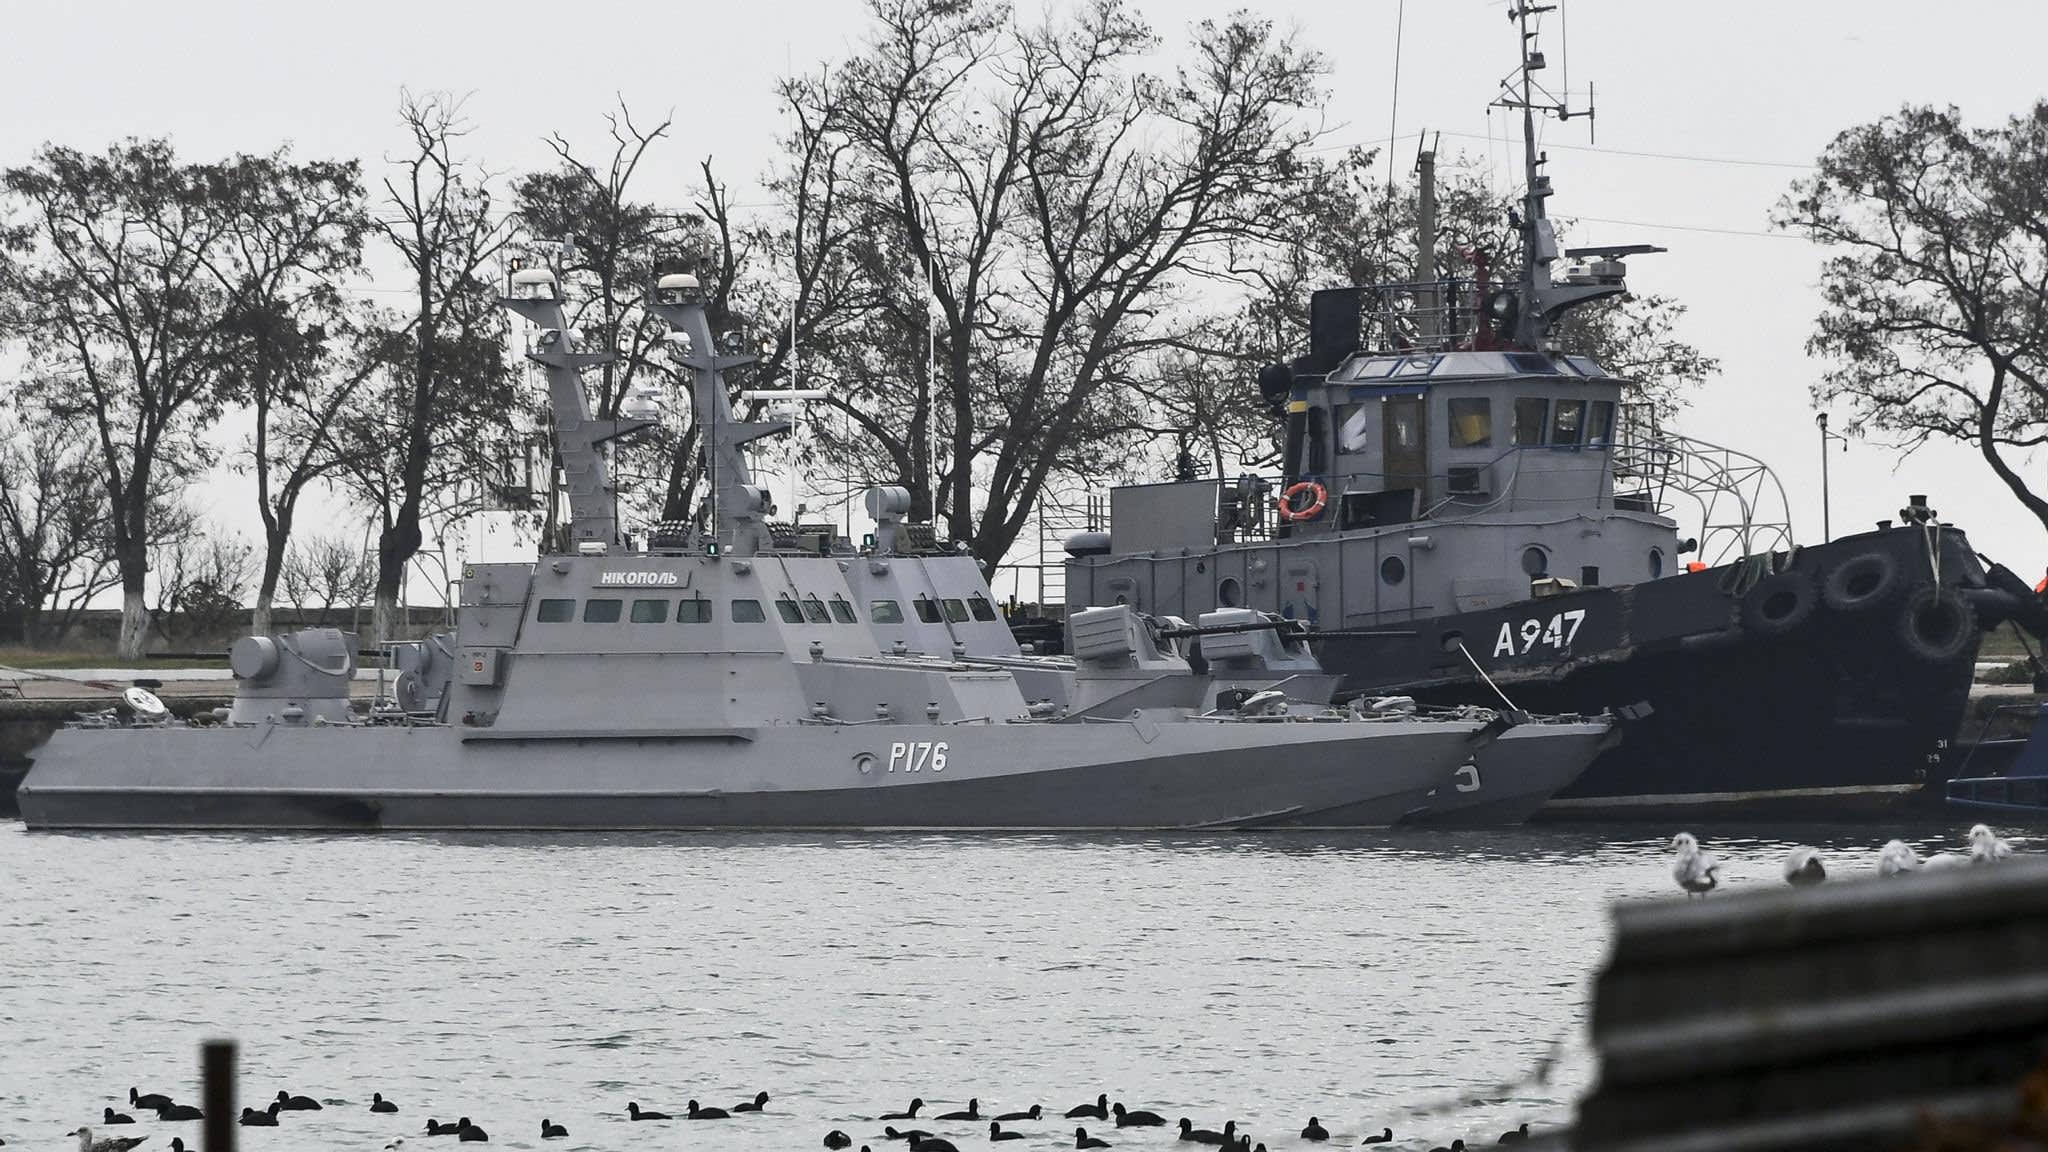 Russia holds Ukrainian navy ships following Black Sea skirmish